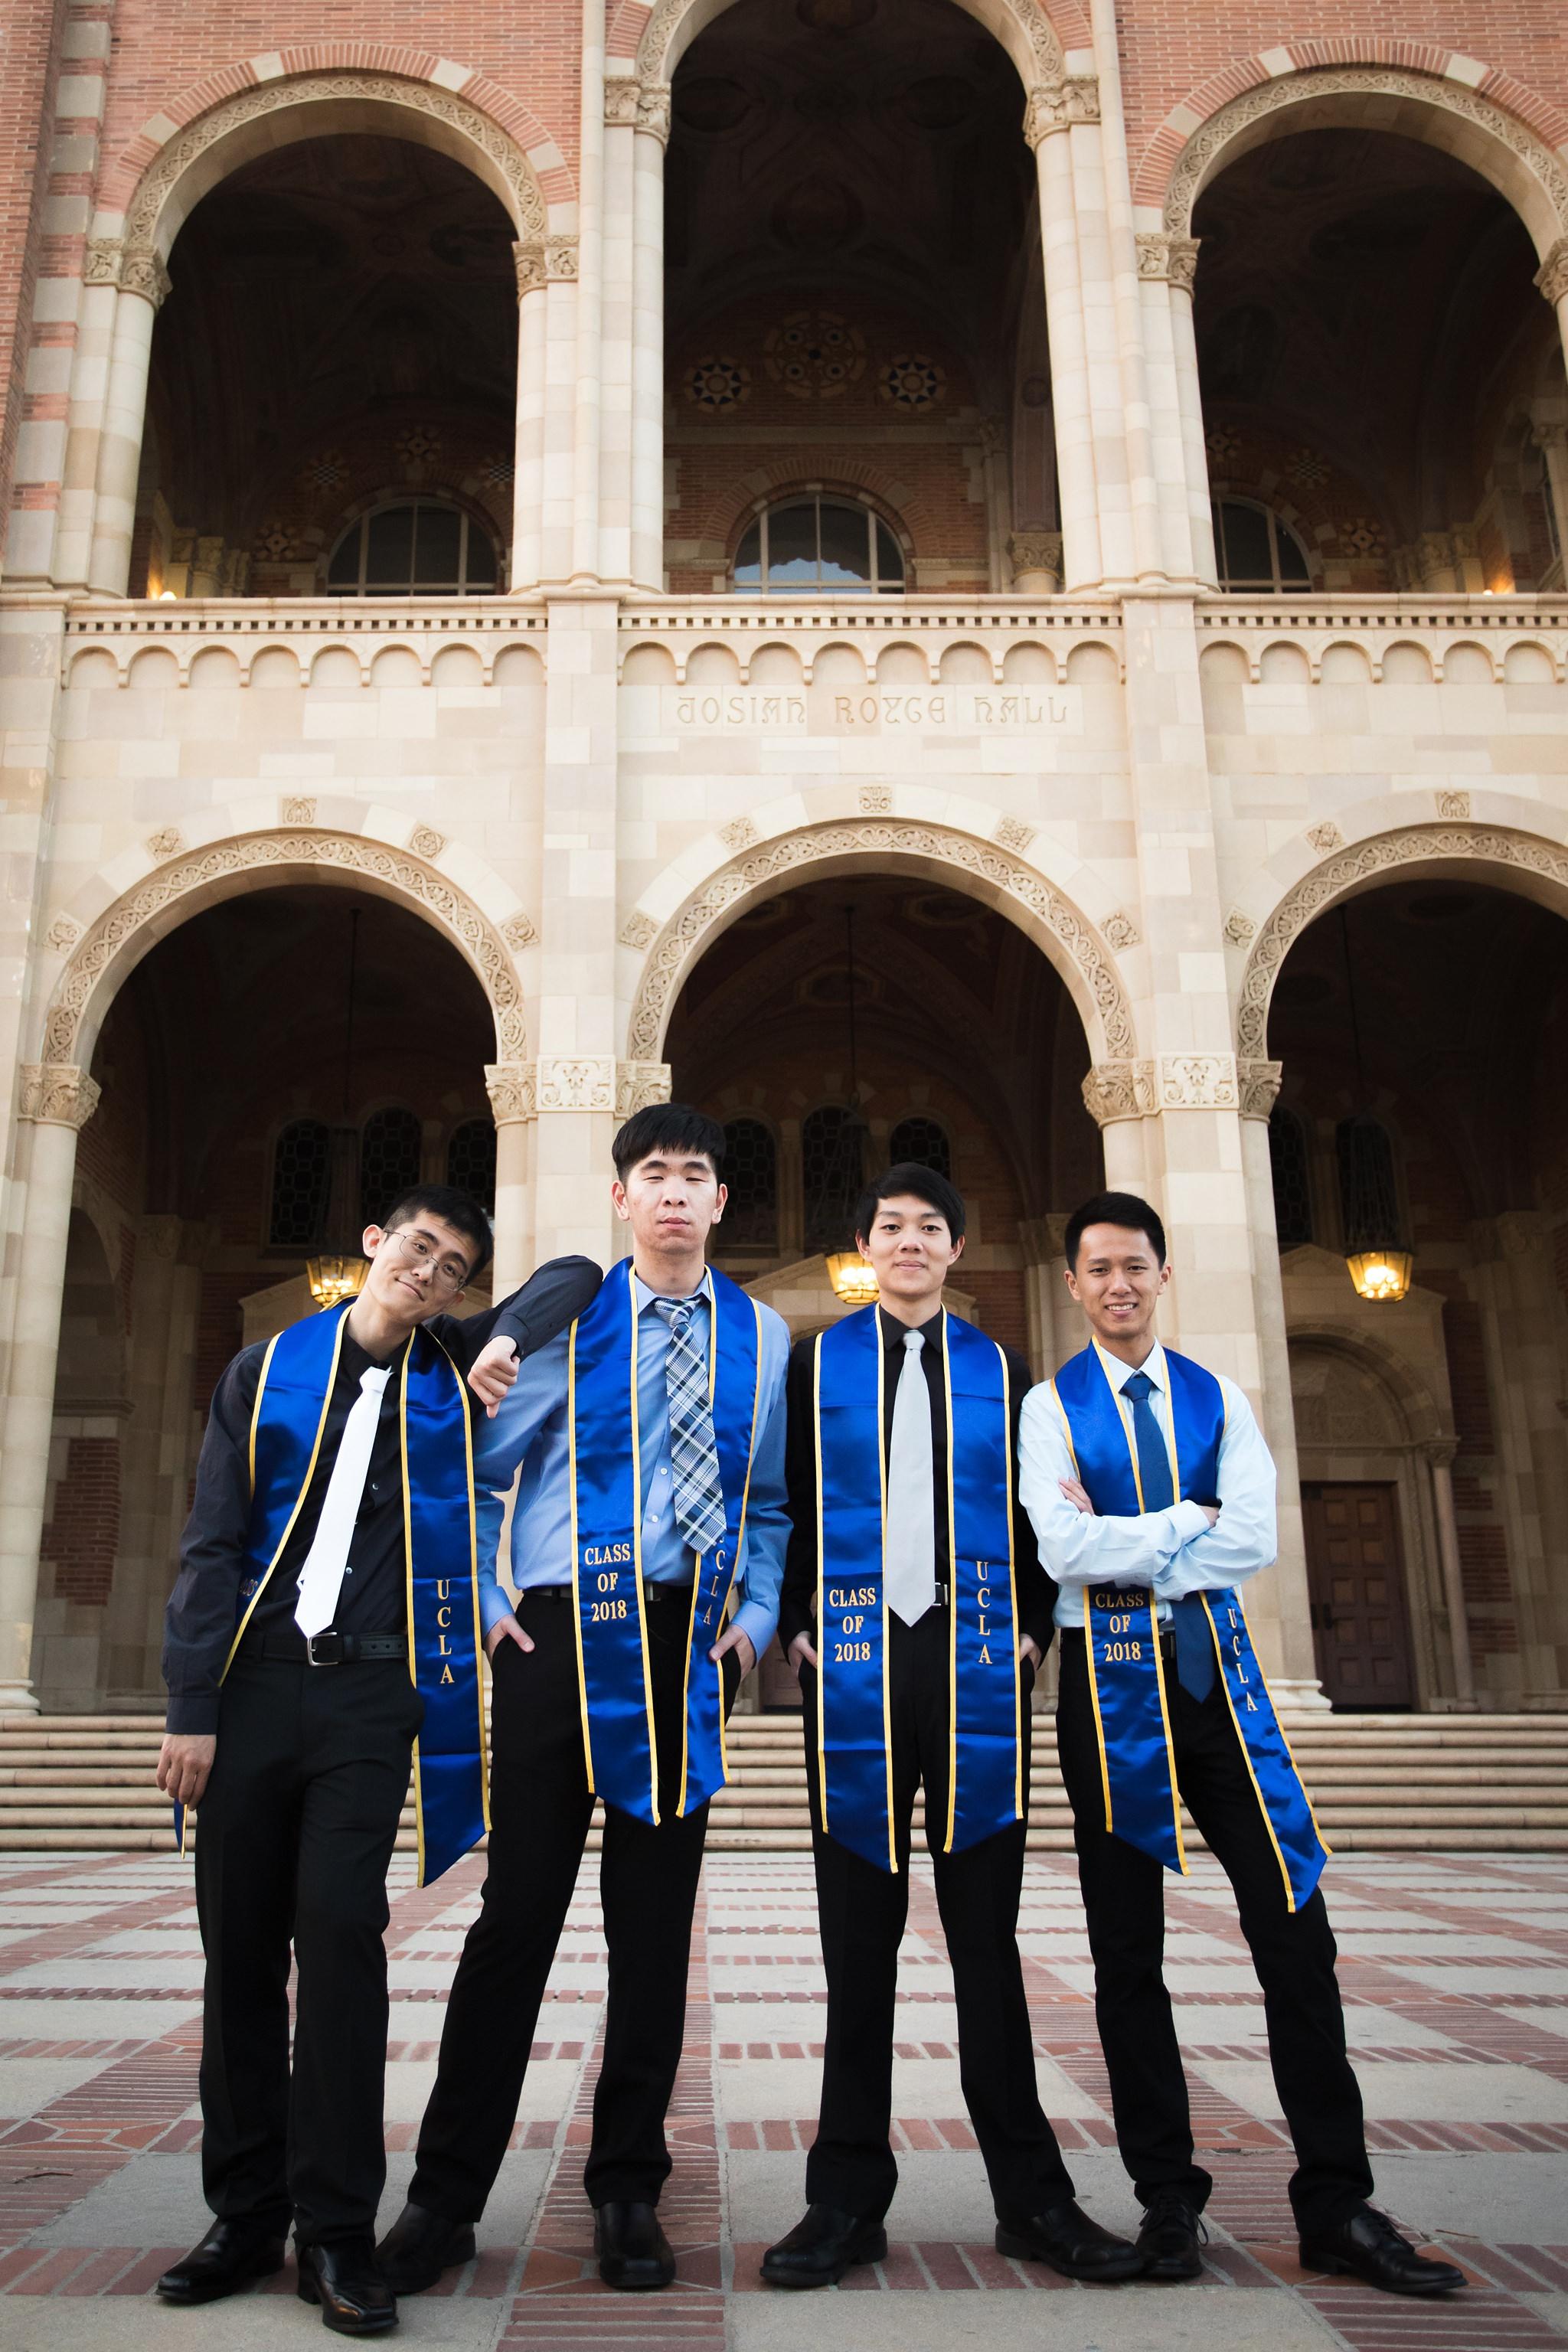 los-angeles-ucla-senior-graduation-portraits-friends-at-royce-hall-epic-environmental-photo